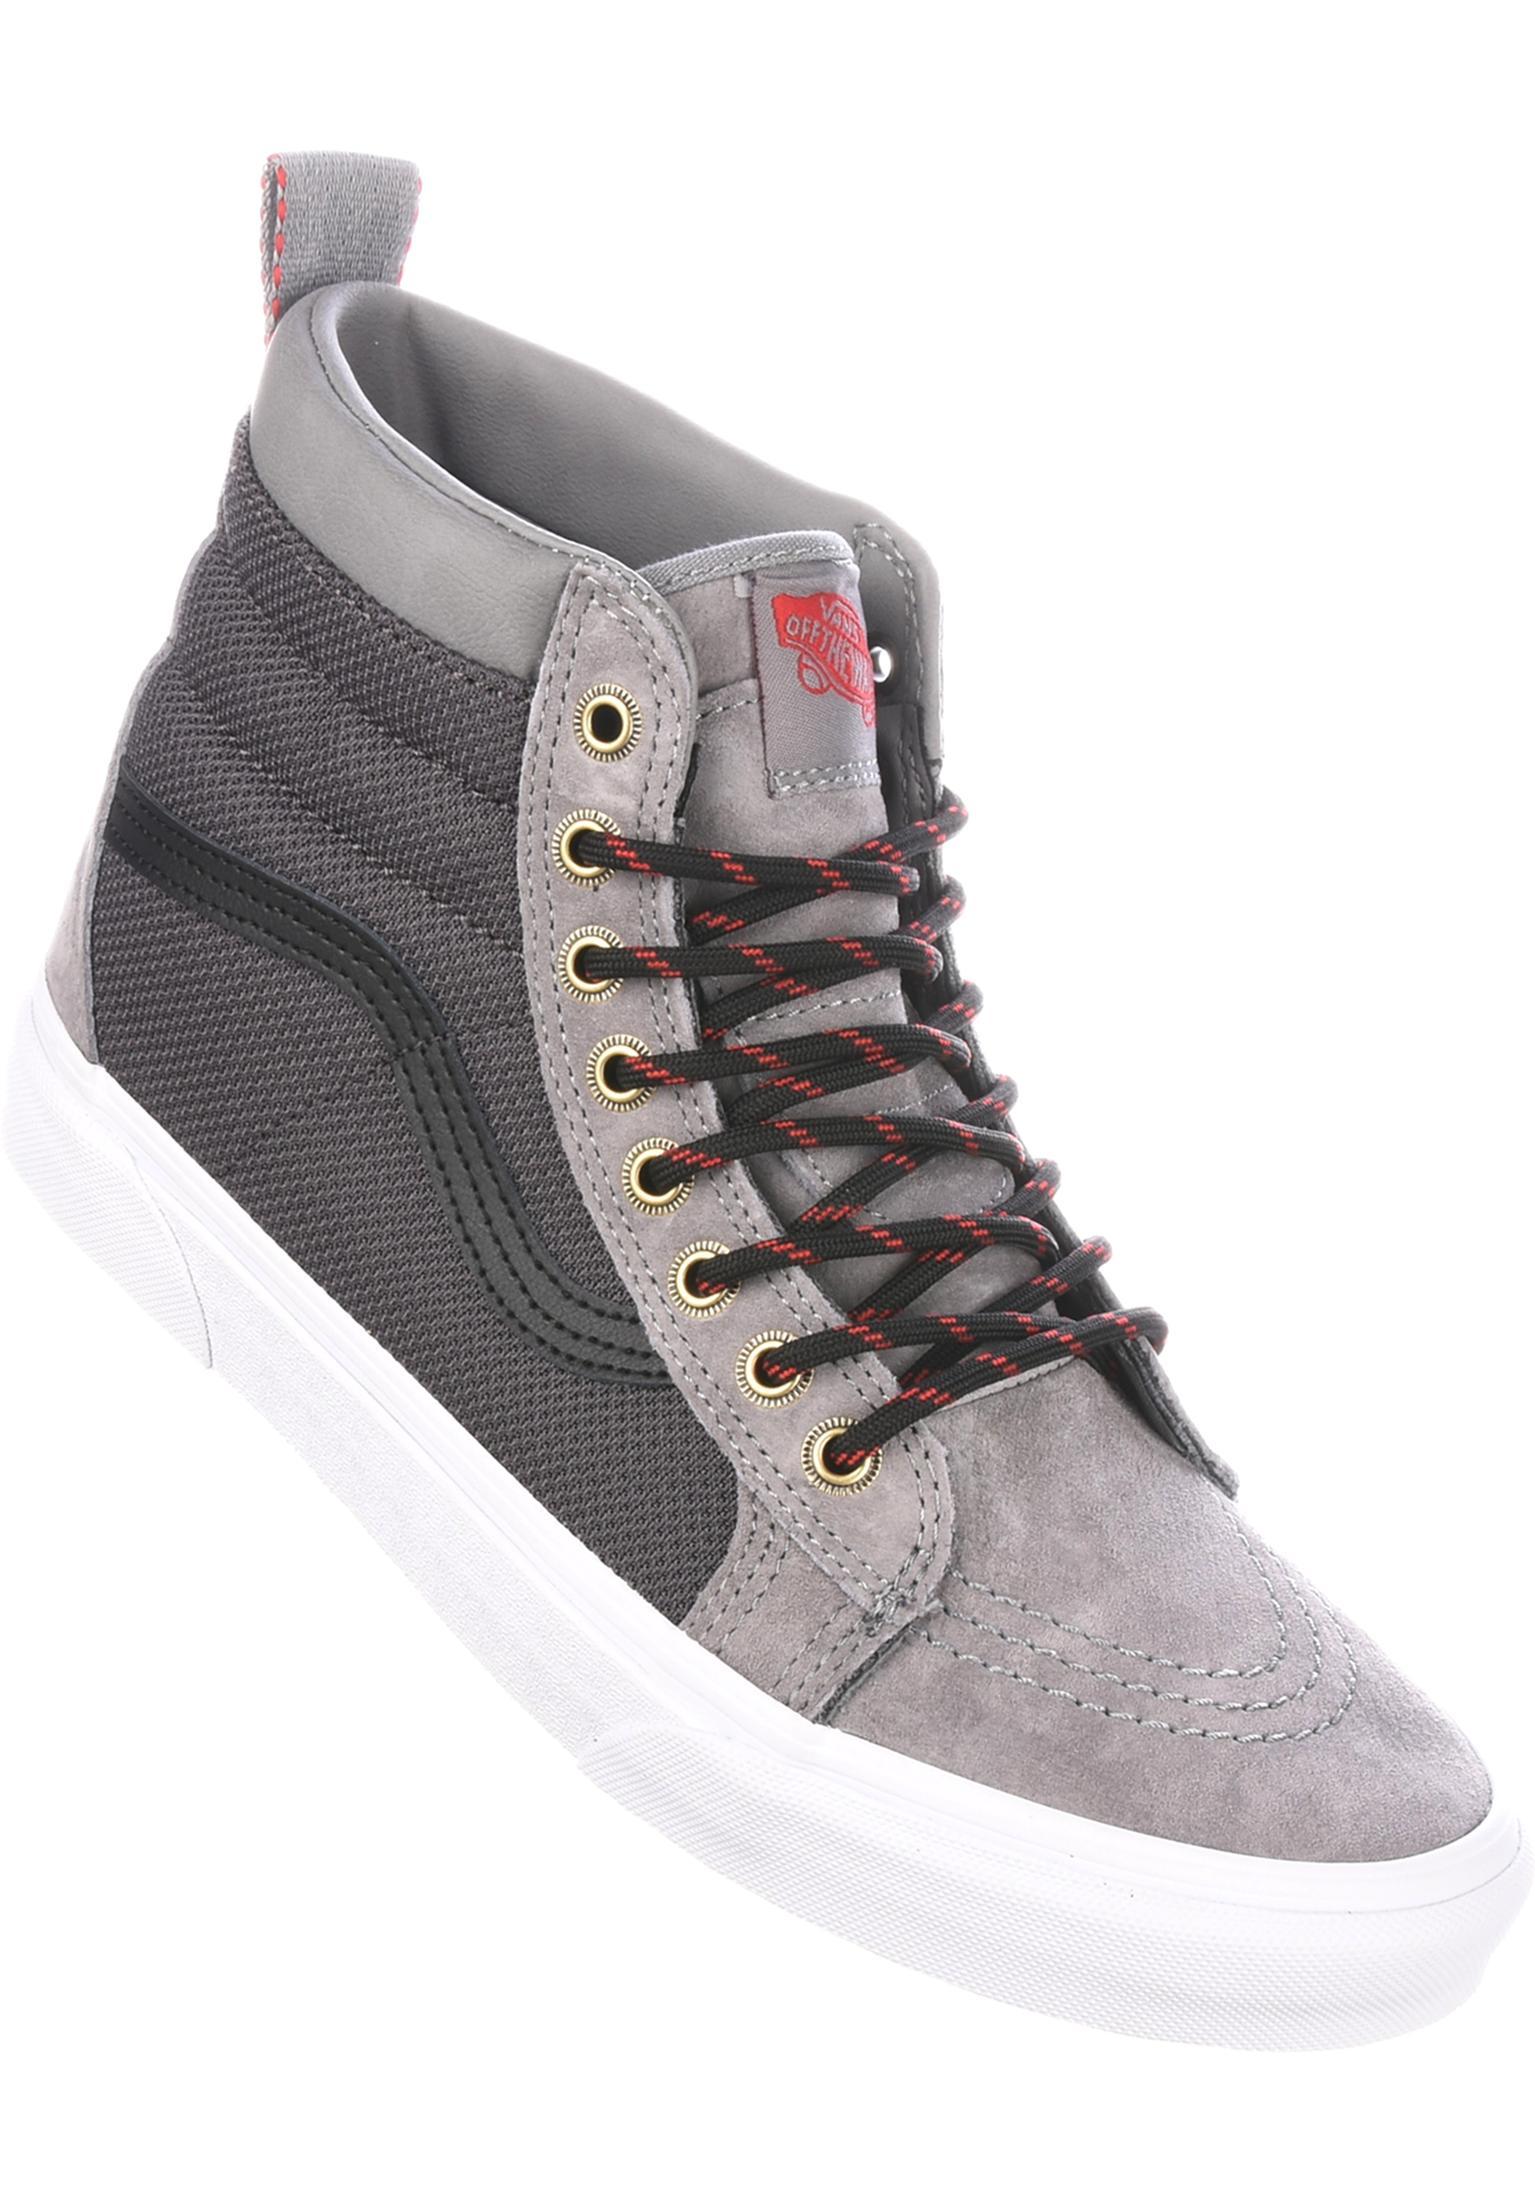 3bf6e11c45 Sk8 Hi MTE Vans All Shoes in frostgray-ballistic for Men